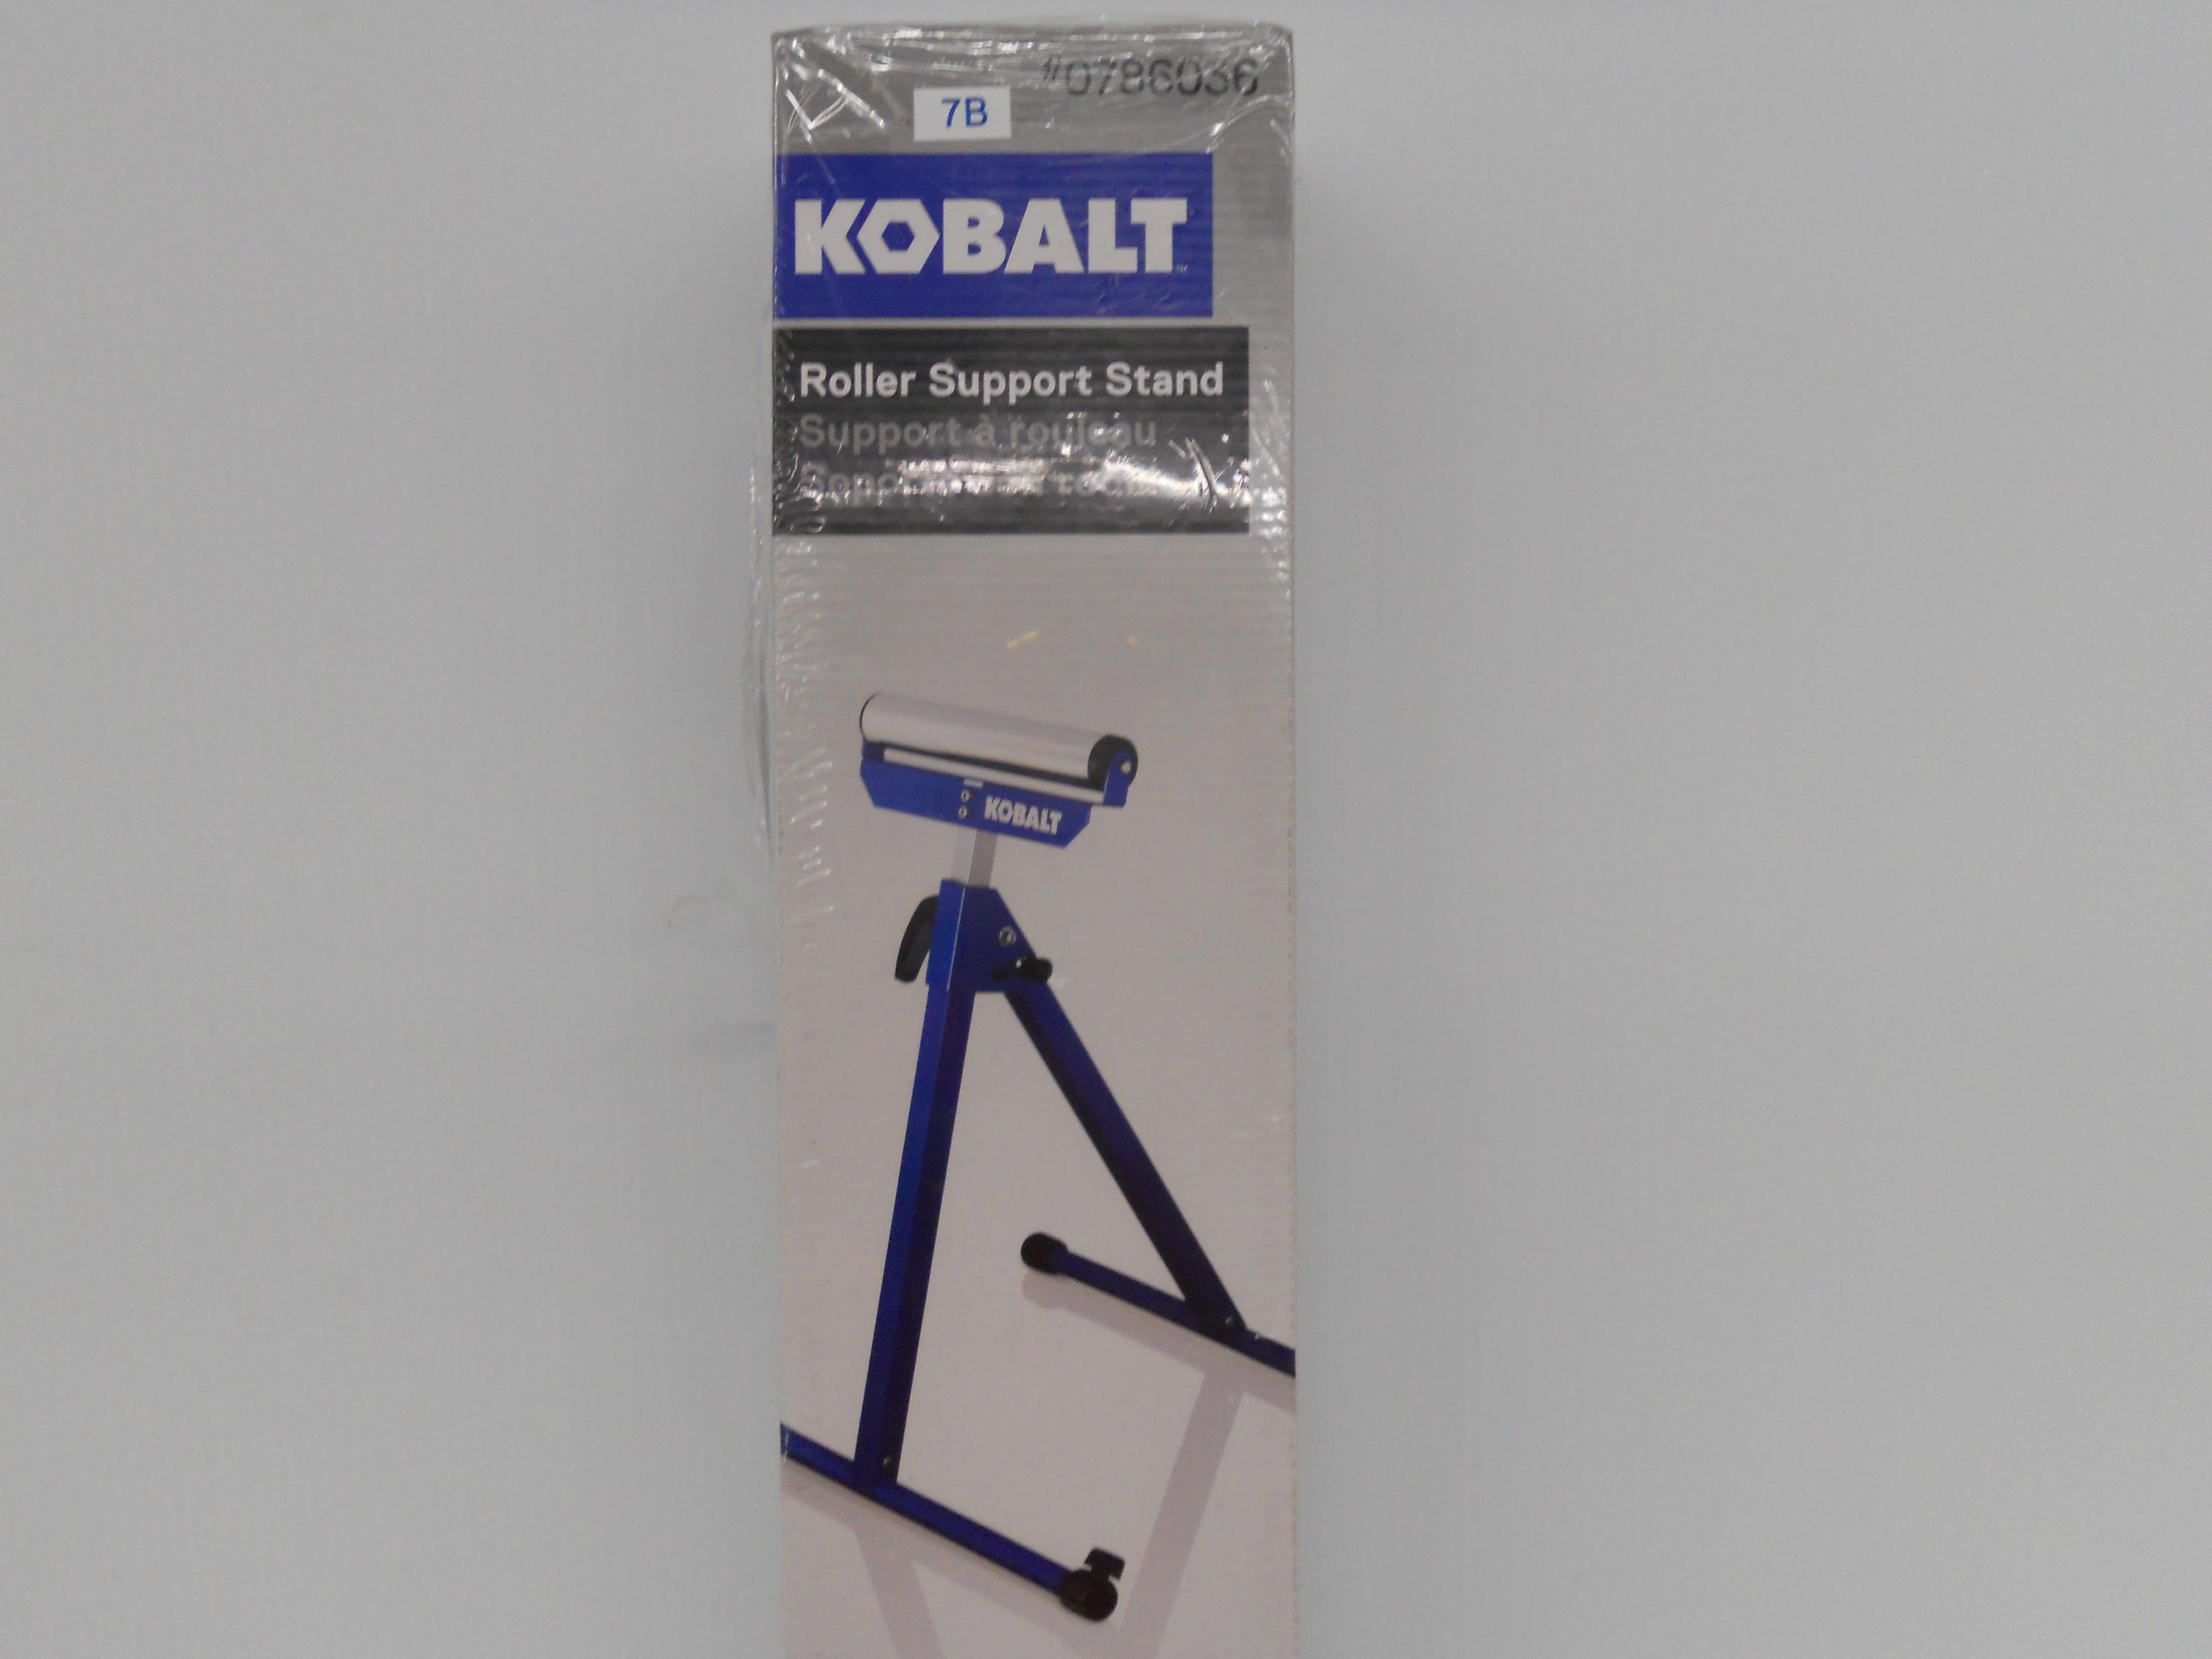 Kobalt Roller support stand